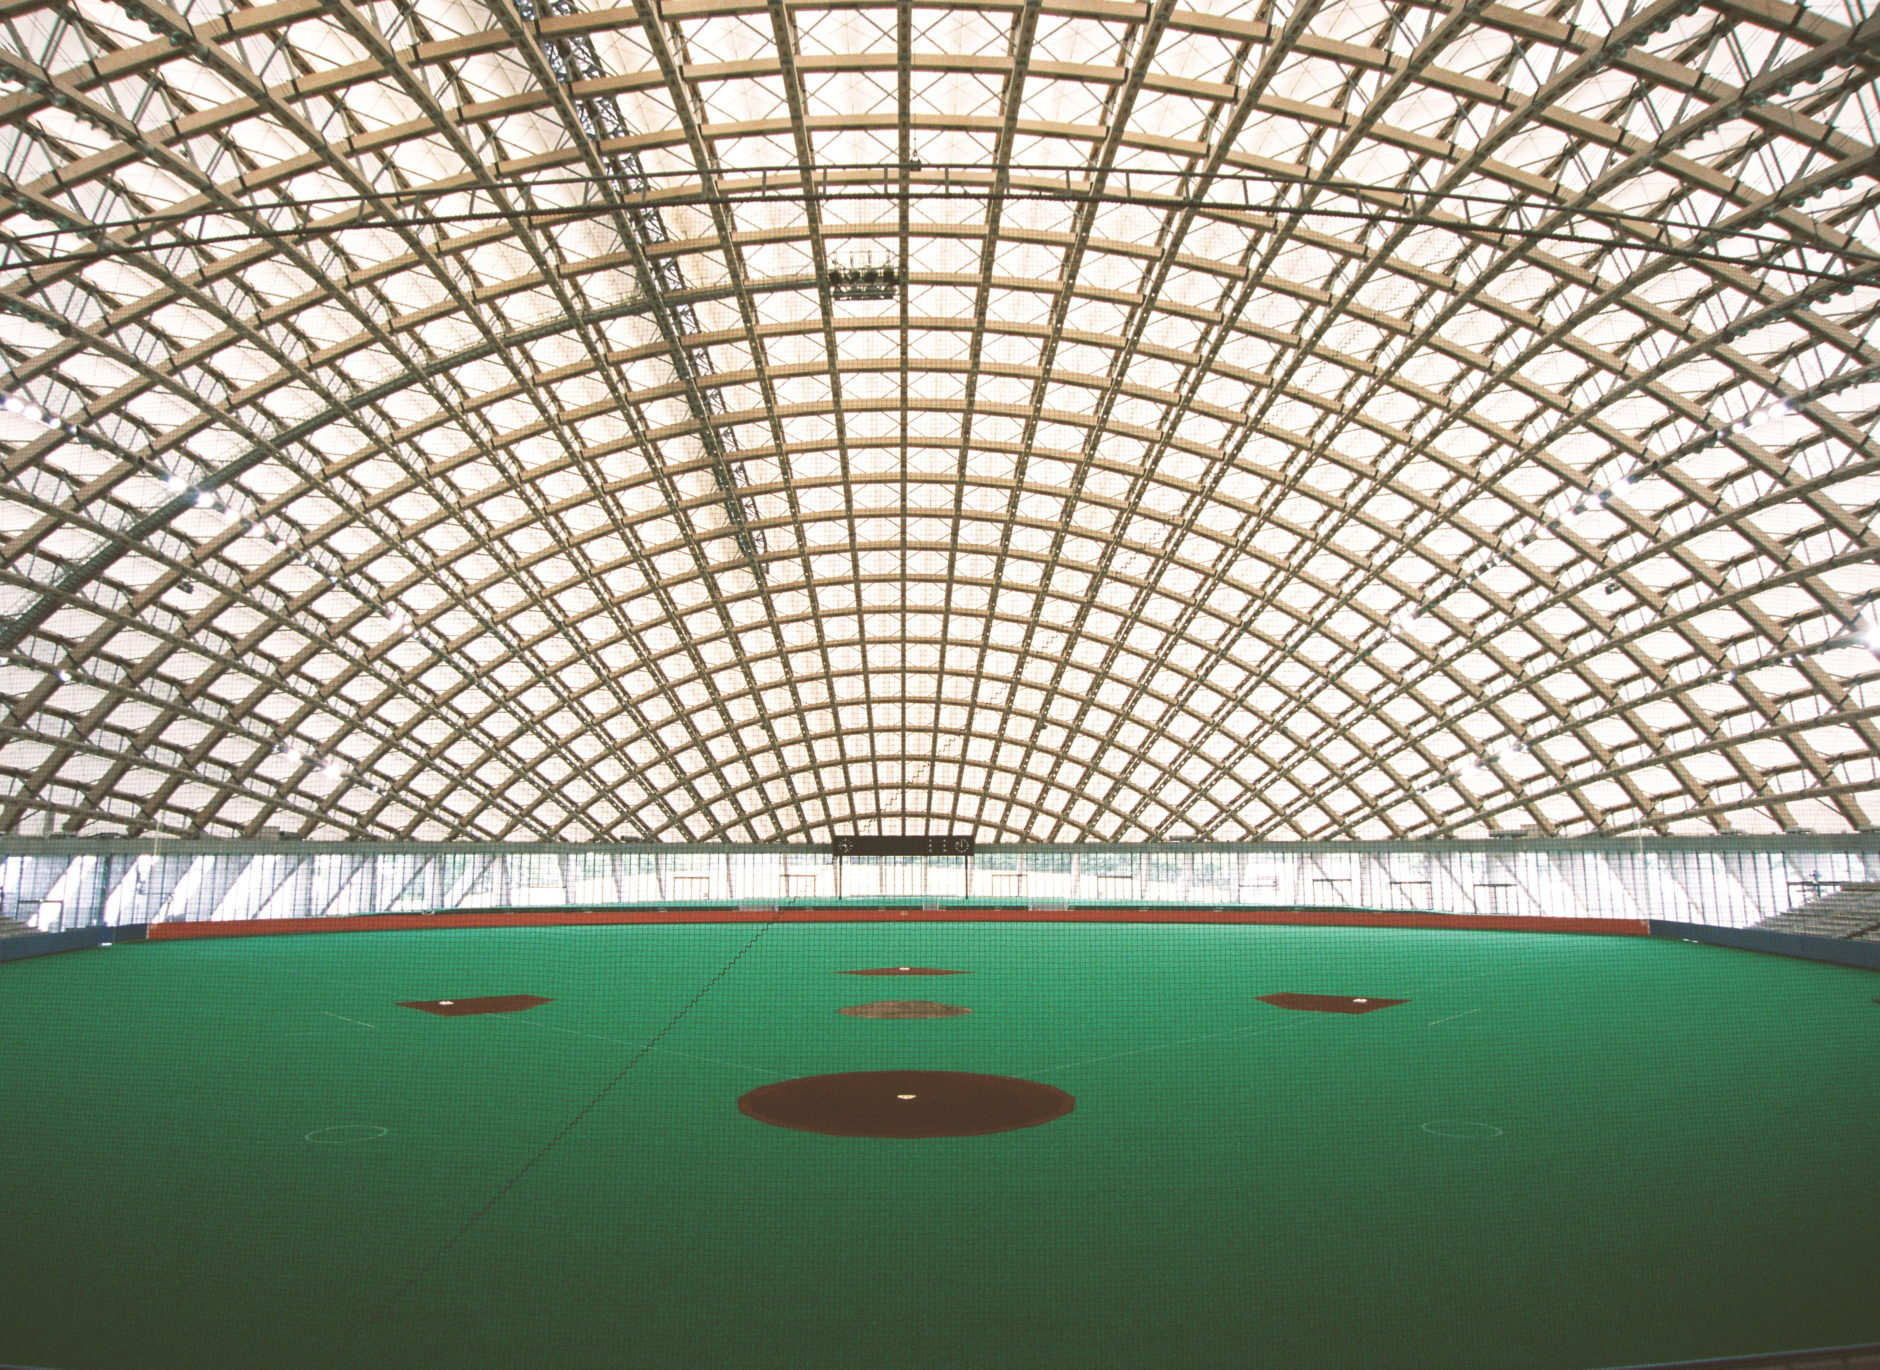 Toyo Ito & Associates Architects, Dome in Odate (multipurpose dome), 1993-7, Odate-shi, Akita, Japan. Photo: Mikio Kamaya.